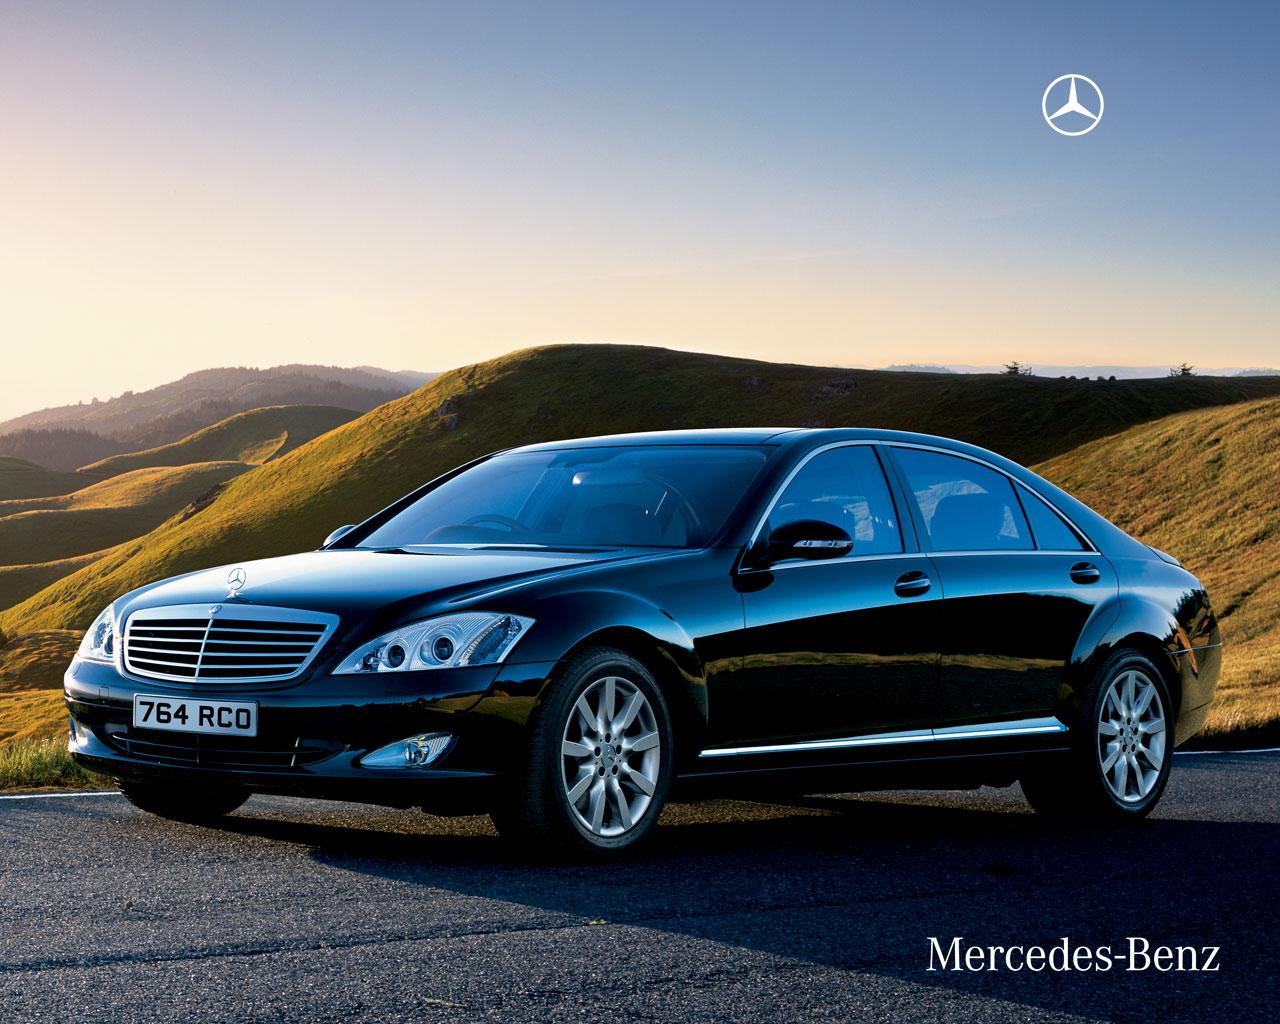 2007 Mercedes-Benz S-Class Specs, Prices, VINs & Recalls - AutoDetective